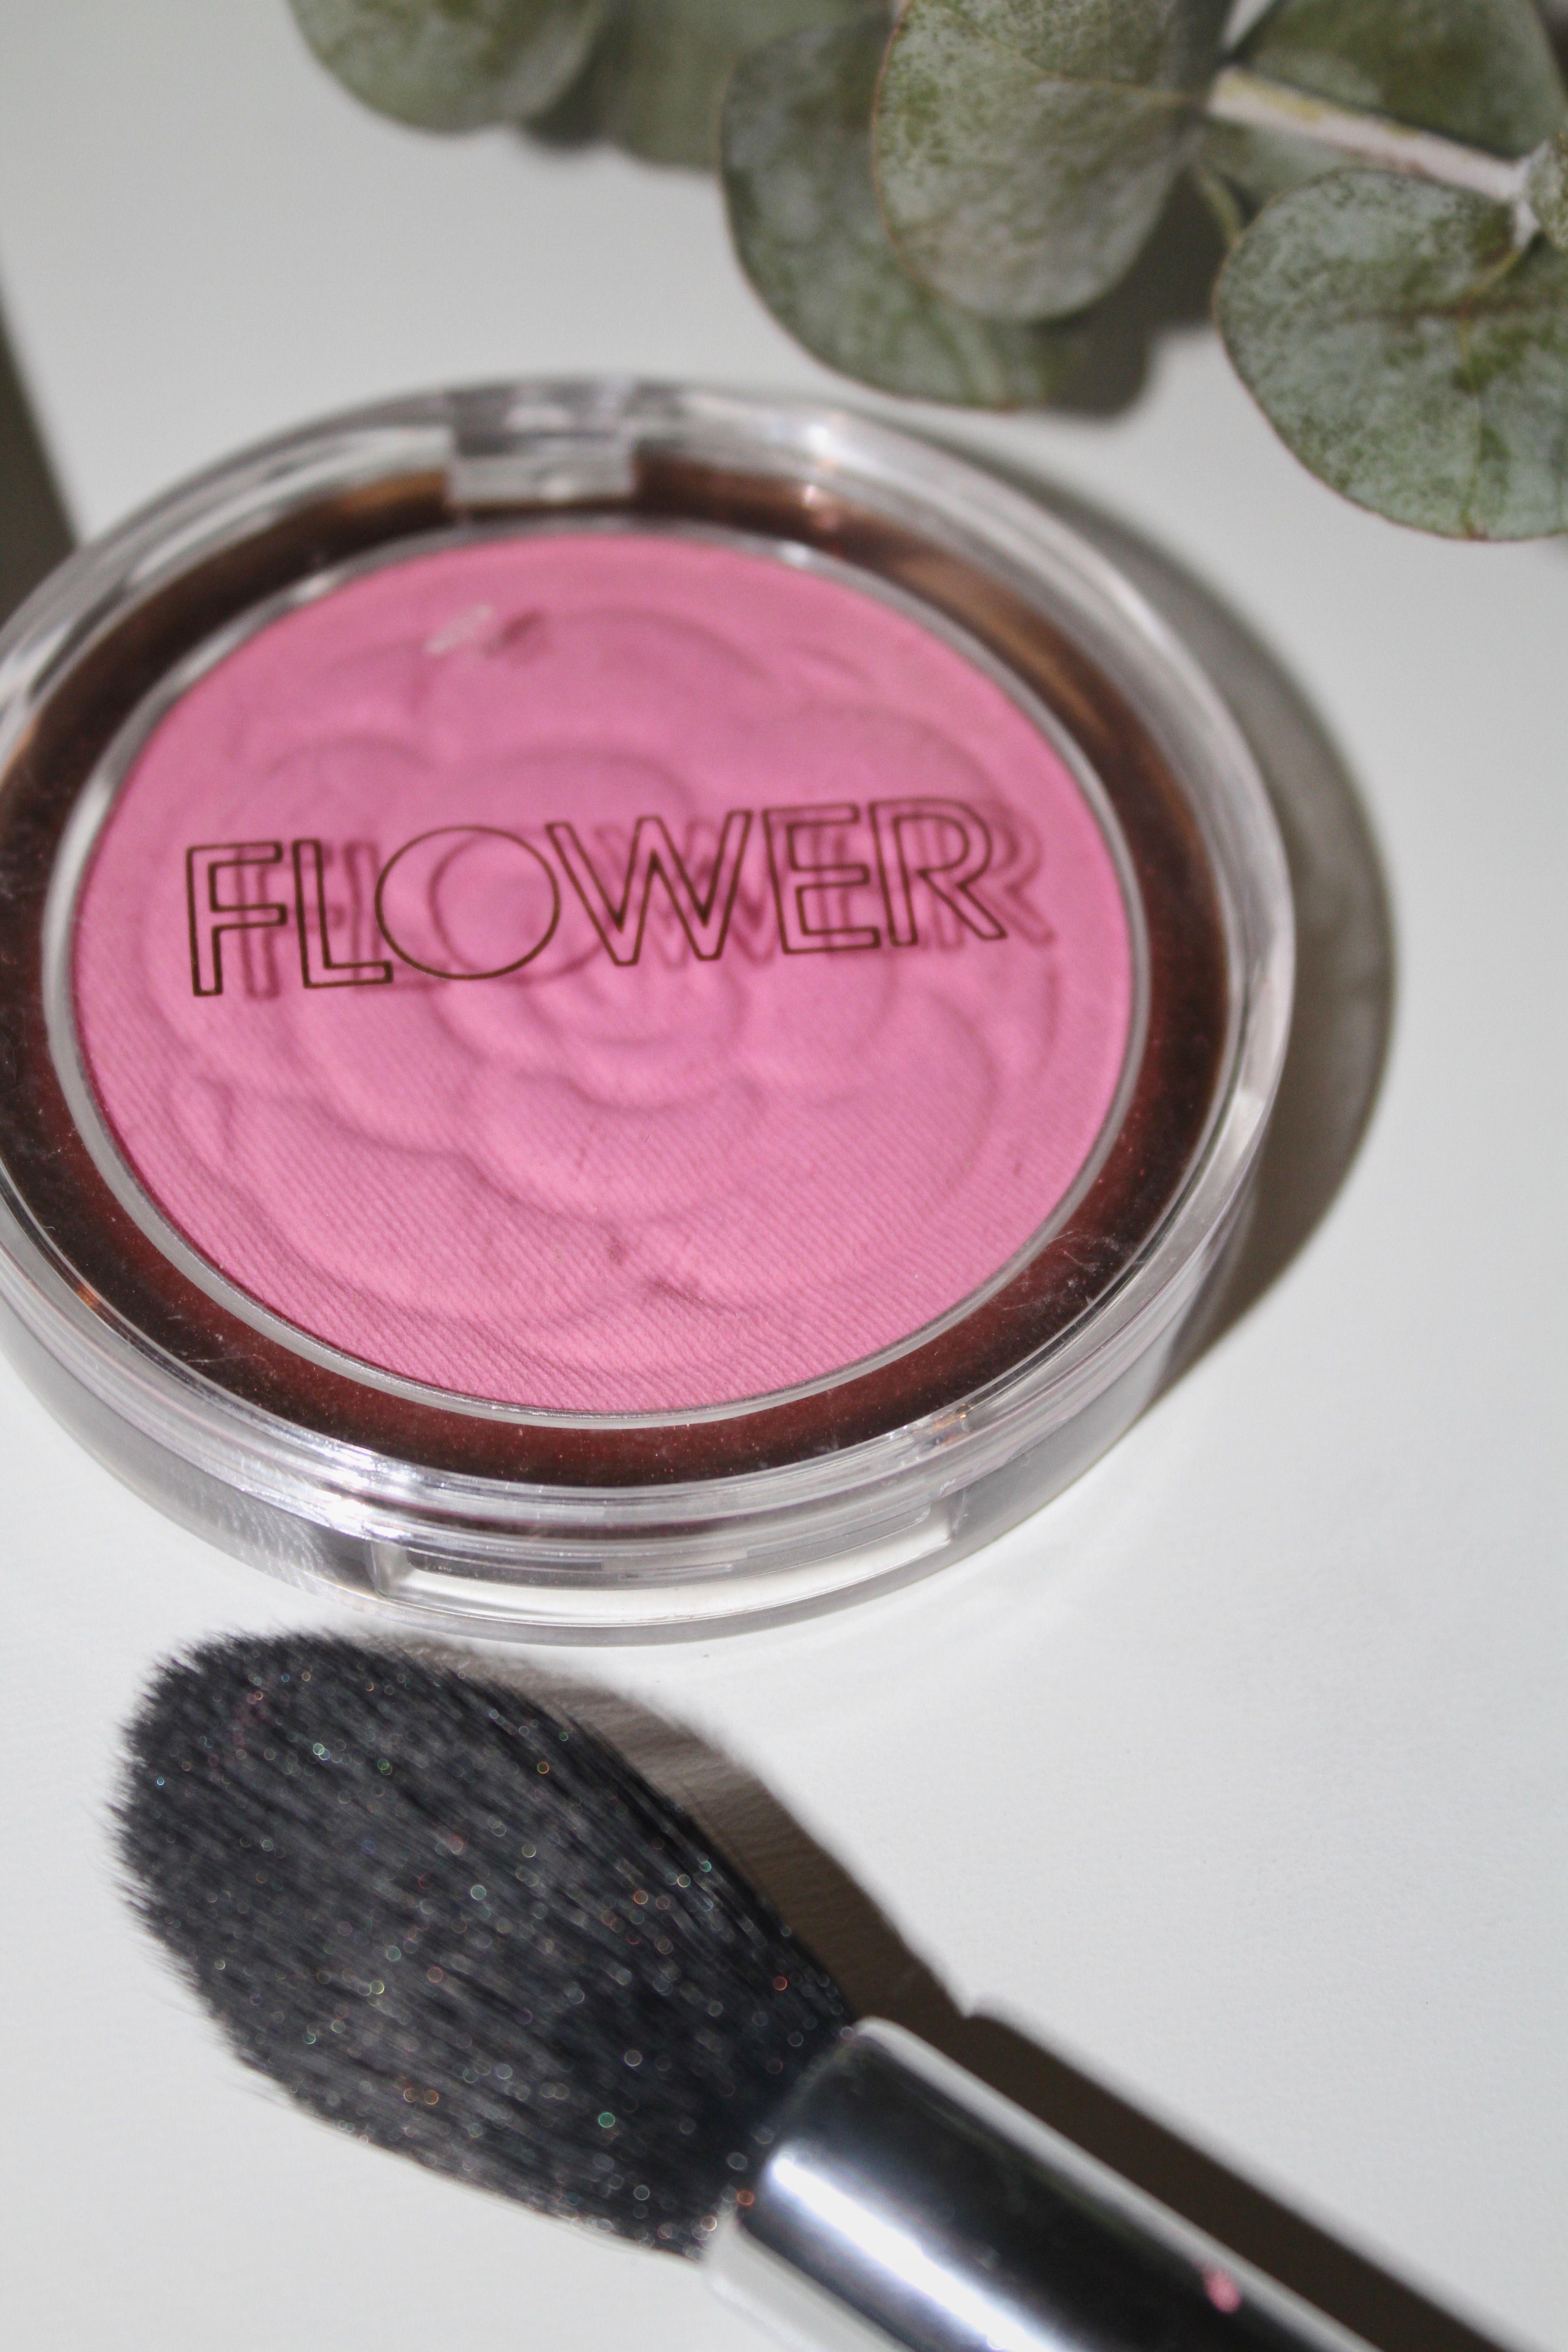 Flower beauty flower pot blush review beauty and skincare pinterest flower beauty flower pot blush review izmirmasajfo